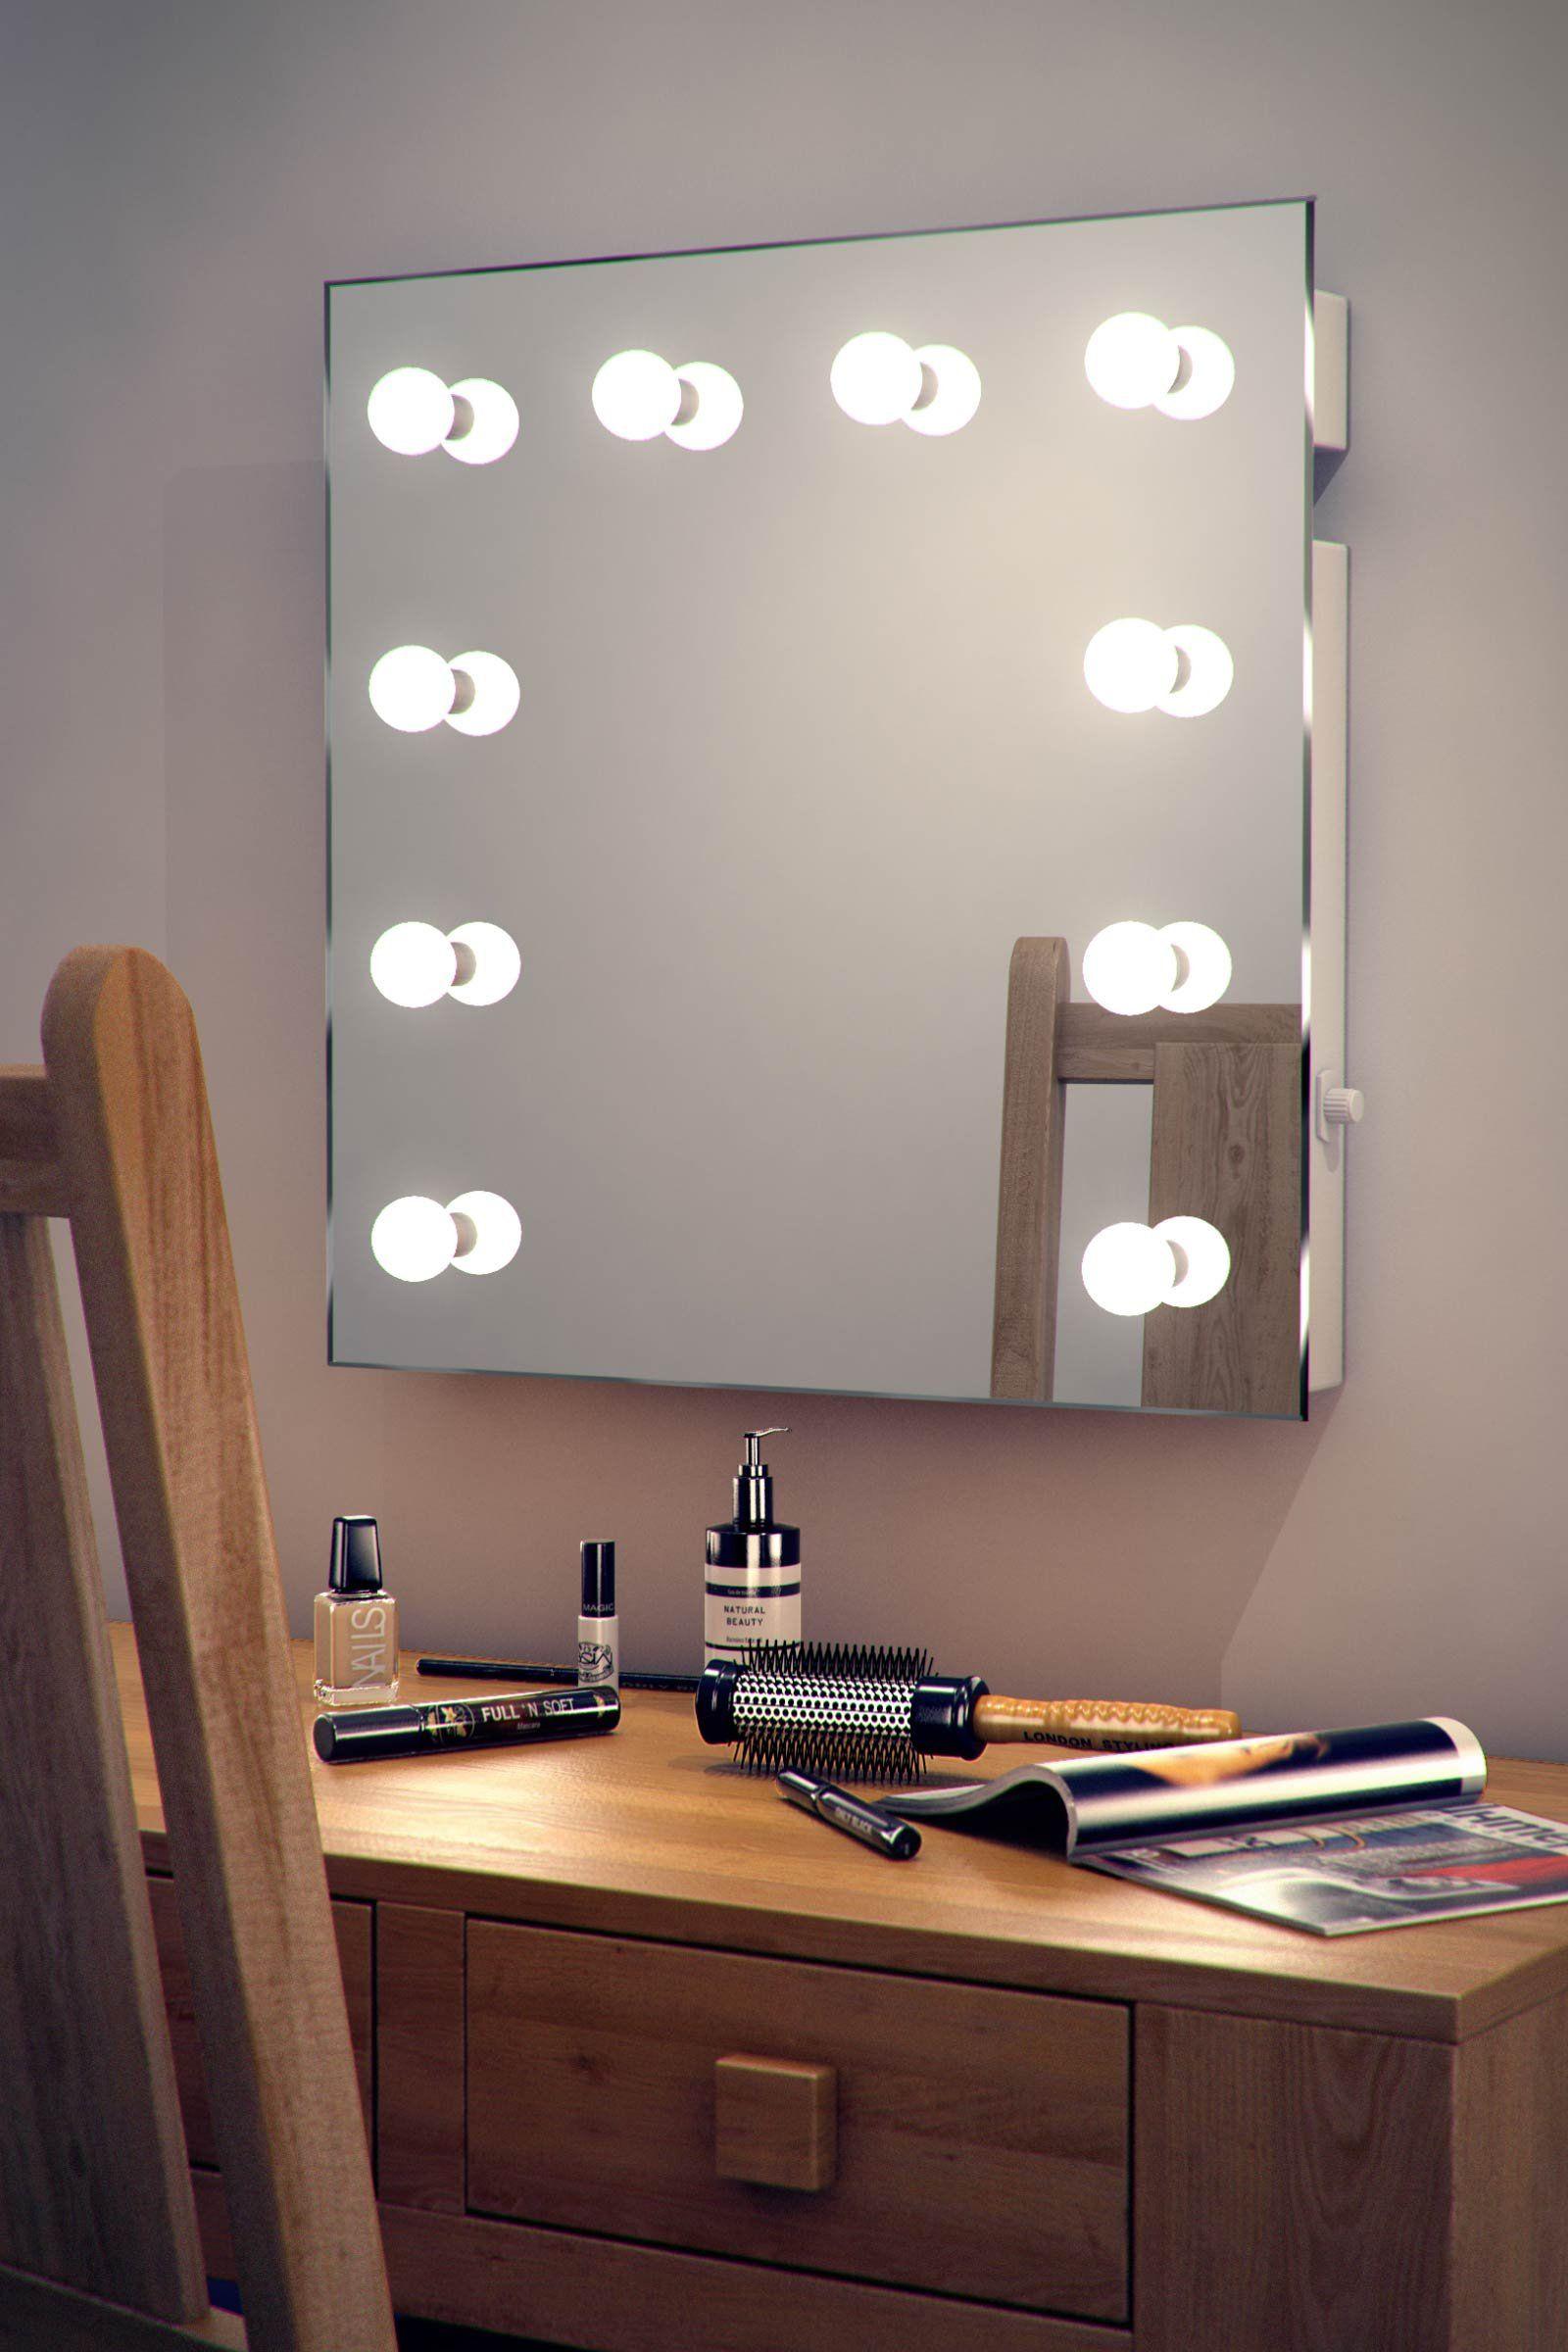 Hollywood Makeup Theatre Dressing Room Vanity Mirror K89 Find Out Even More Regarding The Fanta Dressing Room Mirror Hollywood Mirror Bathroom Mirror Design